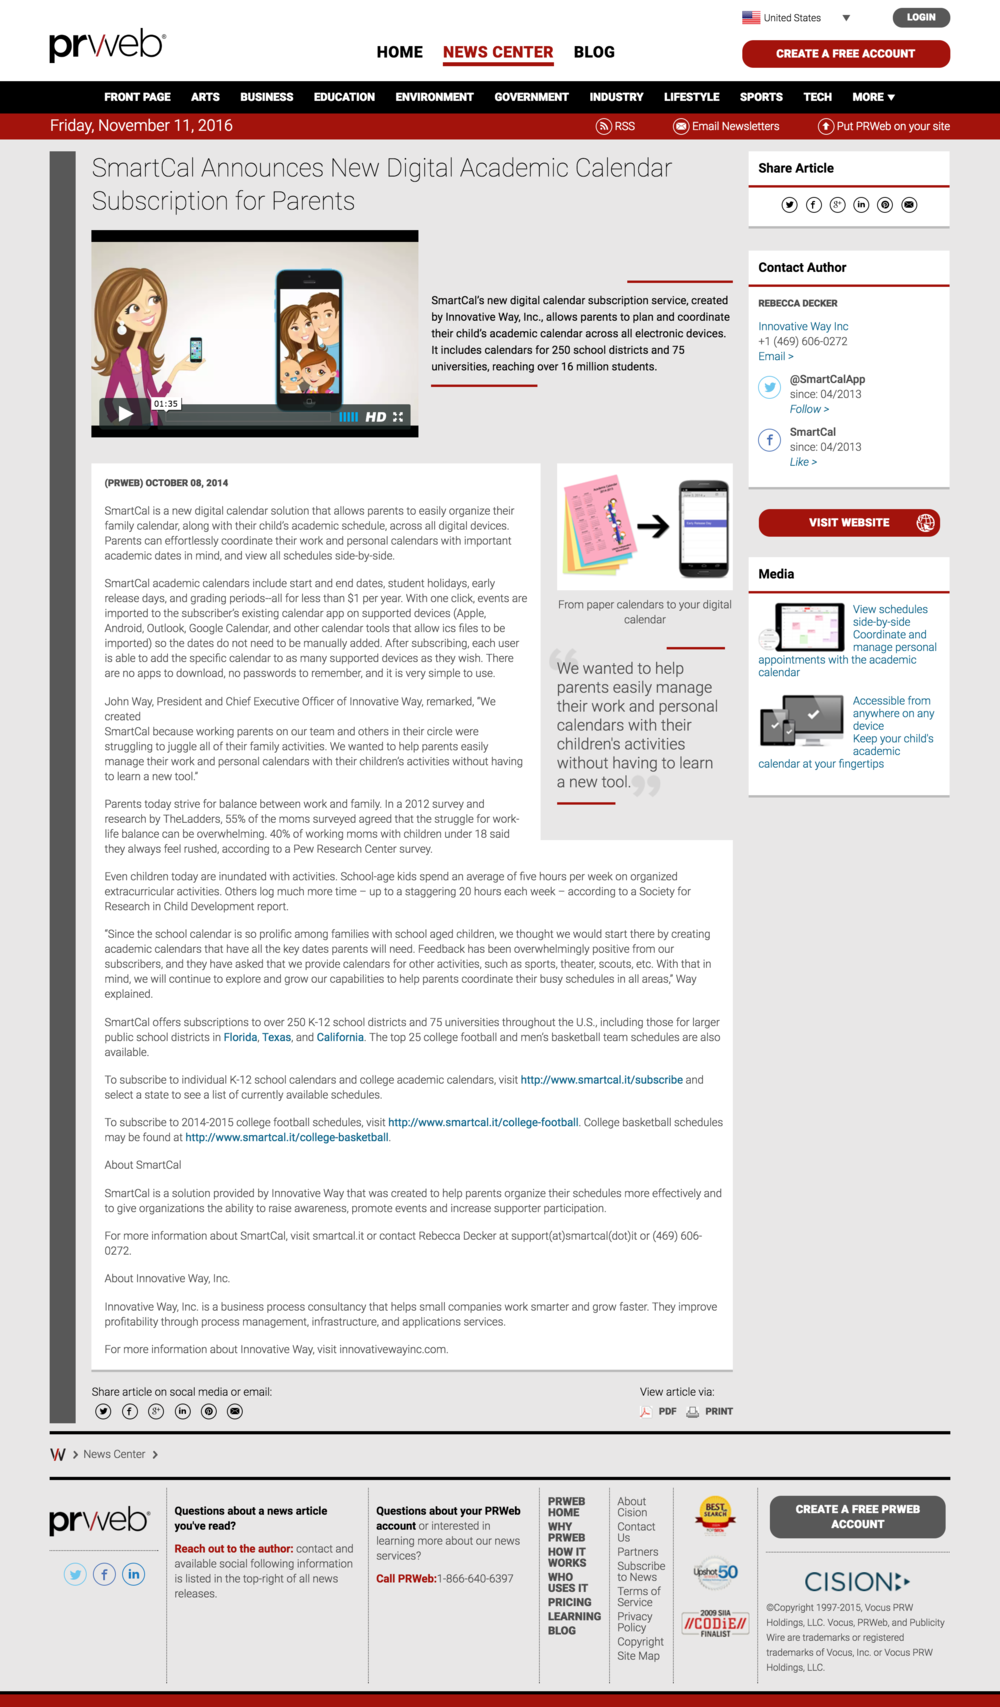 screencapture-prweb-releases-smartcal-academic-calendars-prweb12163394-htm-1478889566575.png